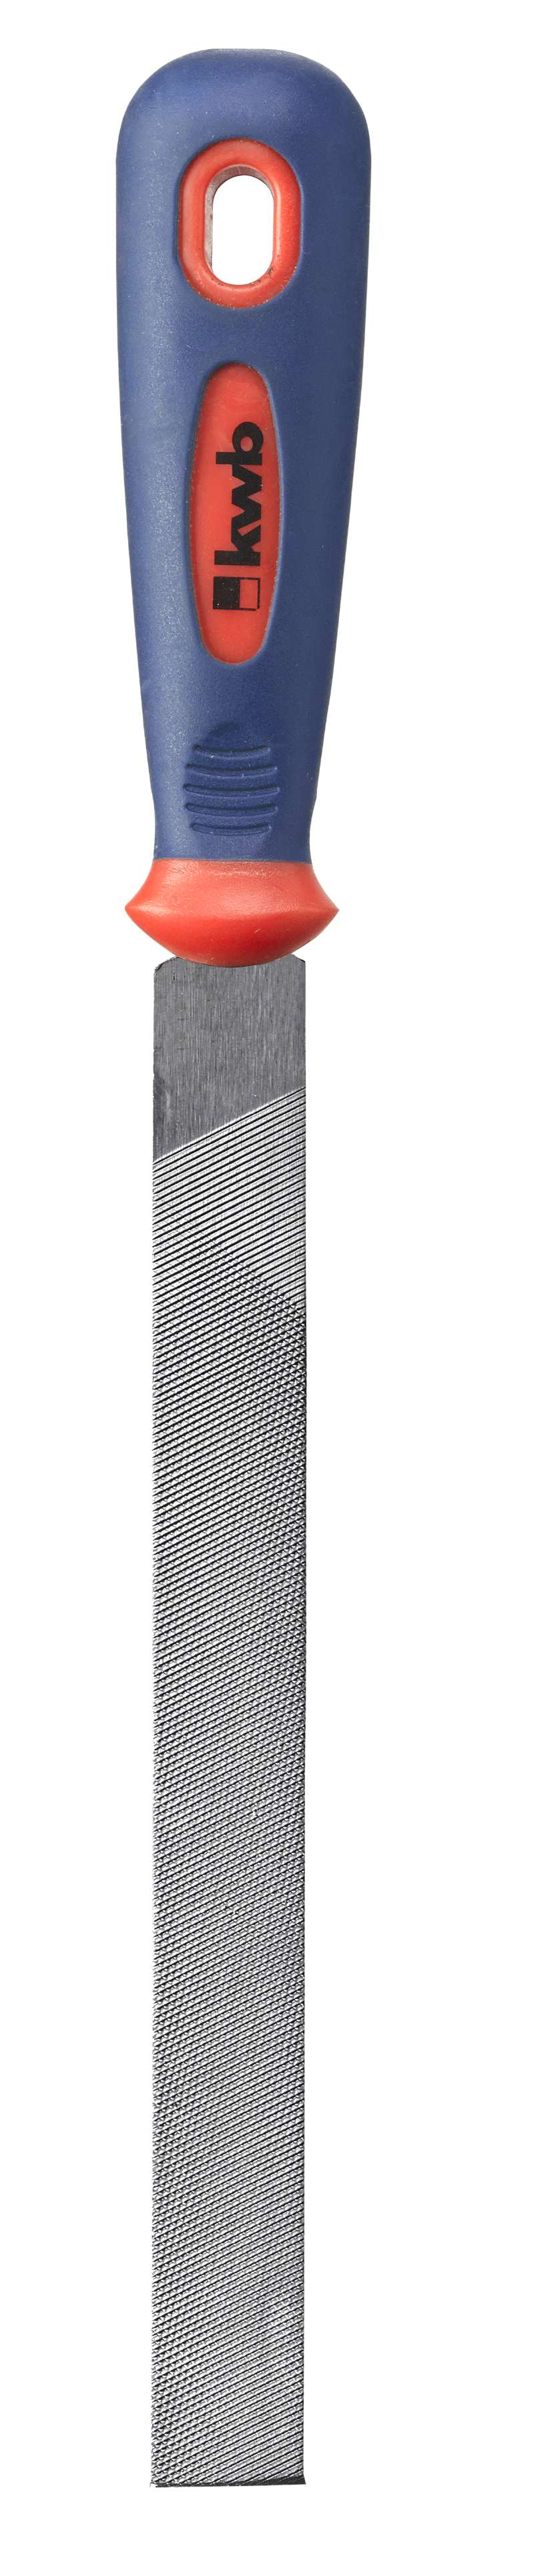 Напильник по металлу Kwb 4803-10 kwb 3772 10